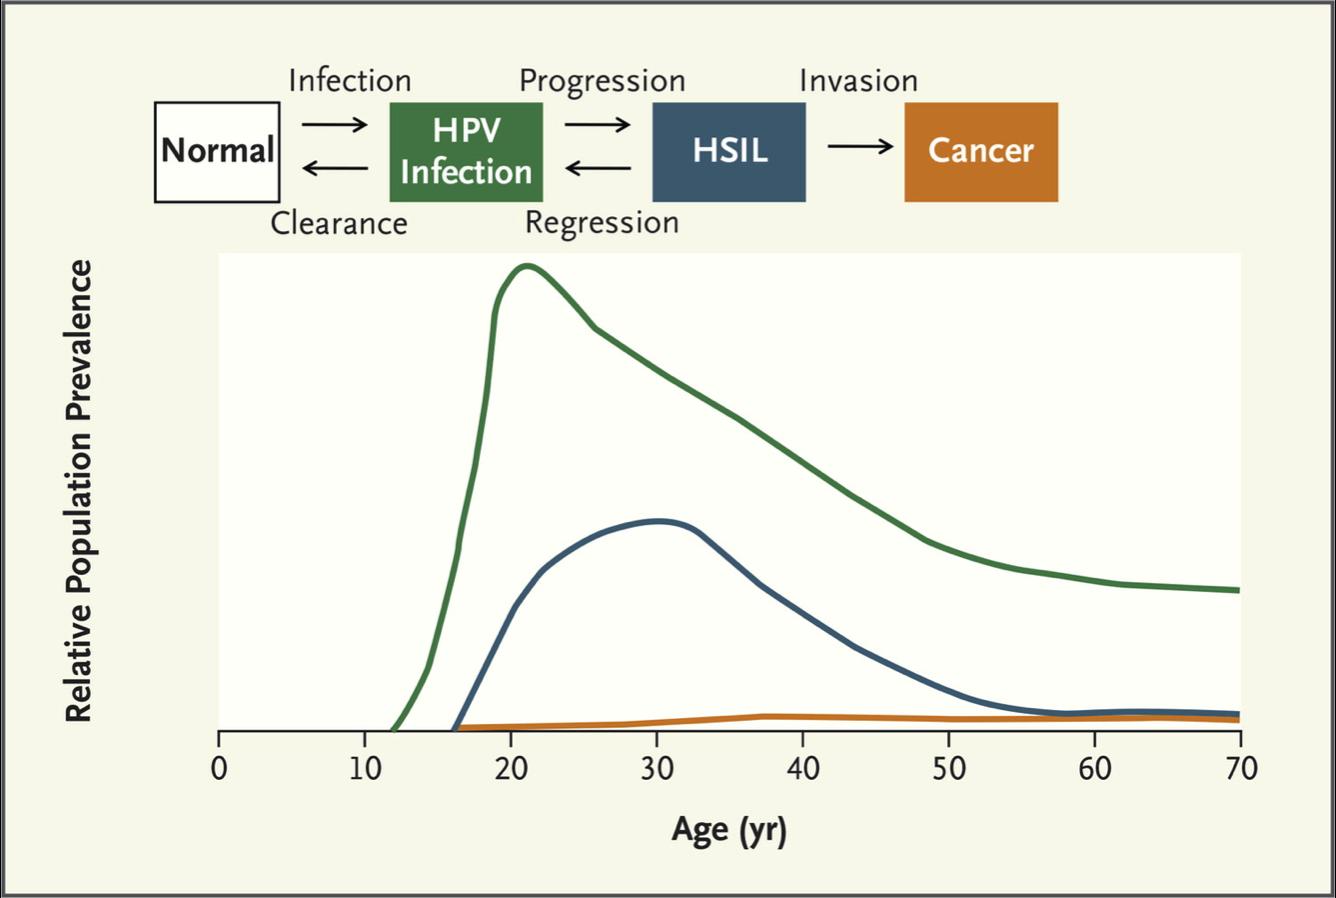 Hpv infection head and neck cancer Dezvoltarea helmintelor